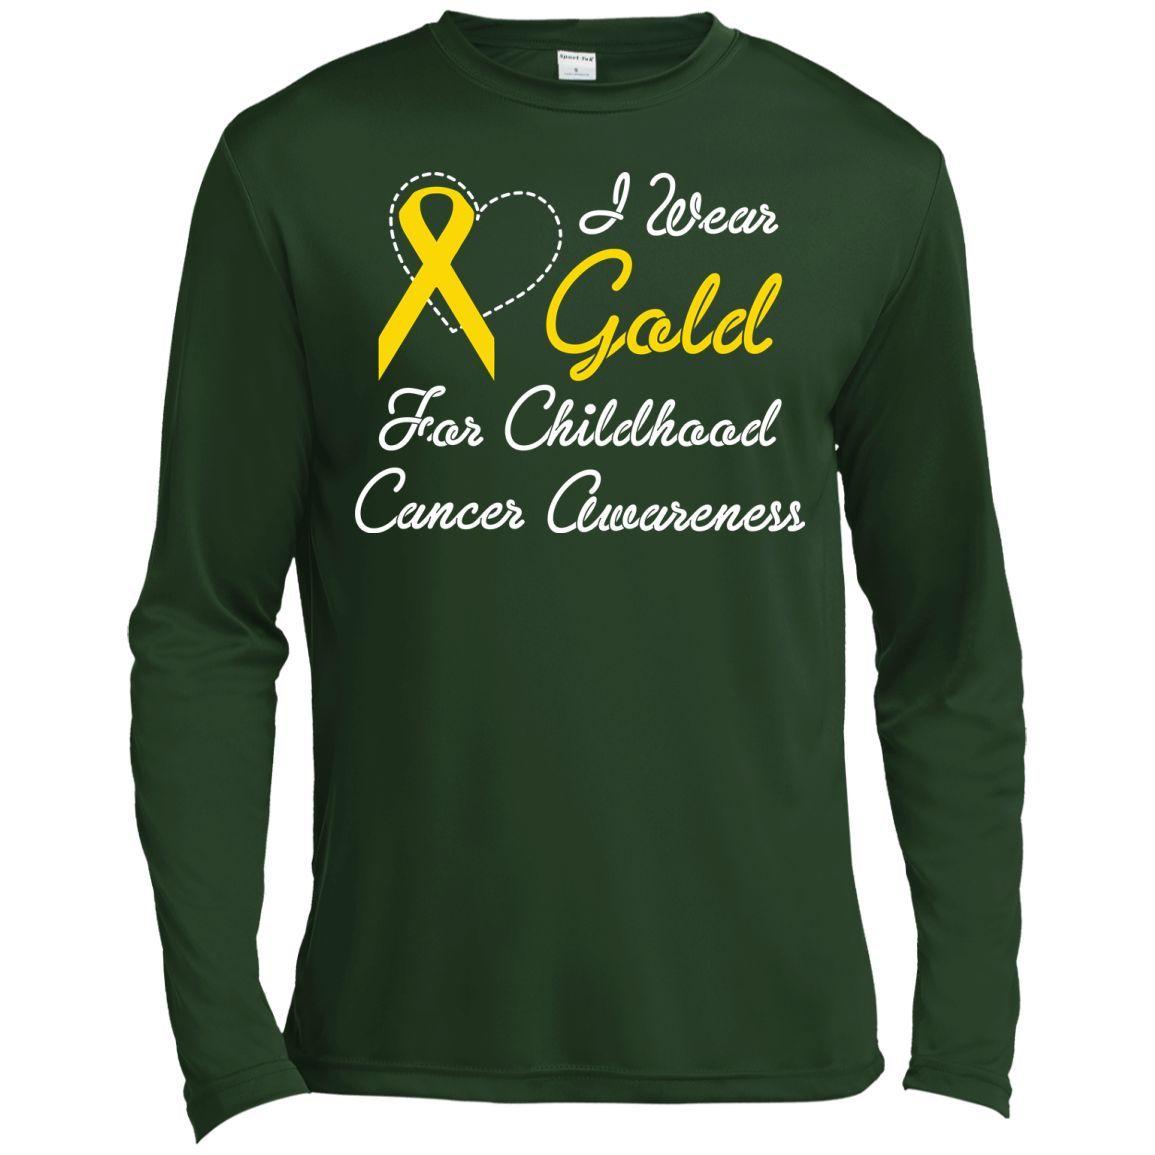 I Wear Gold For Childhood Cancer Awareness Long Sleeve Moisture Absorbing Shirt